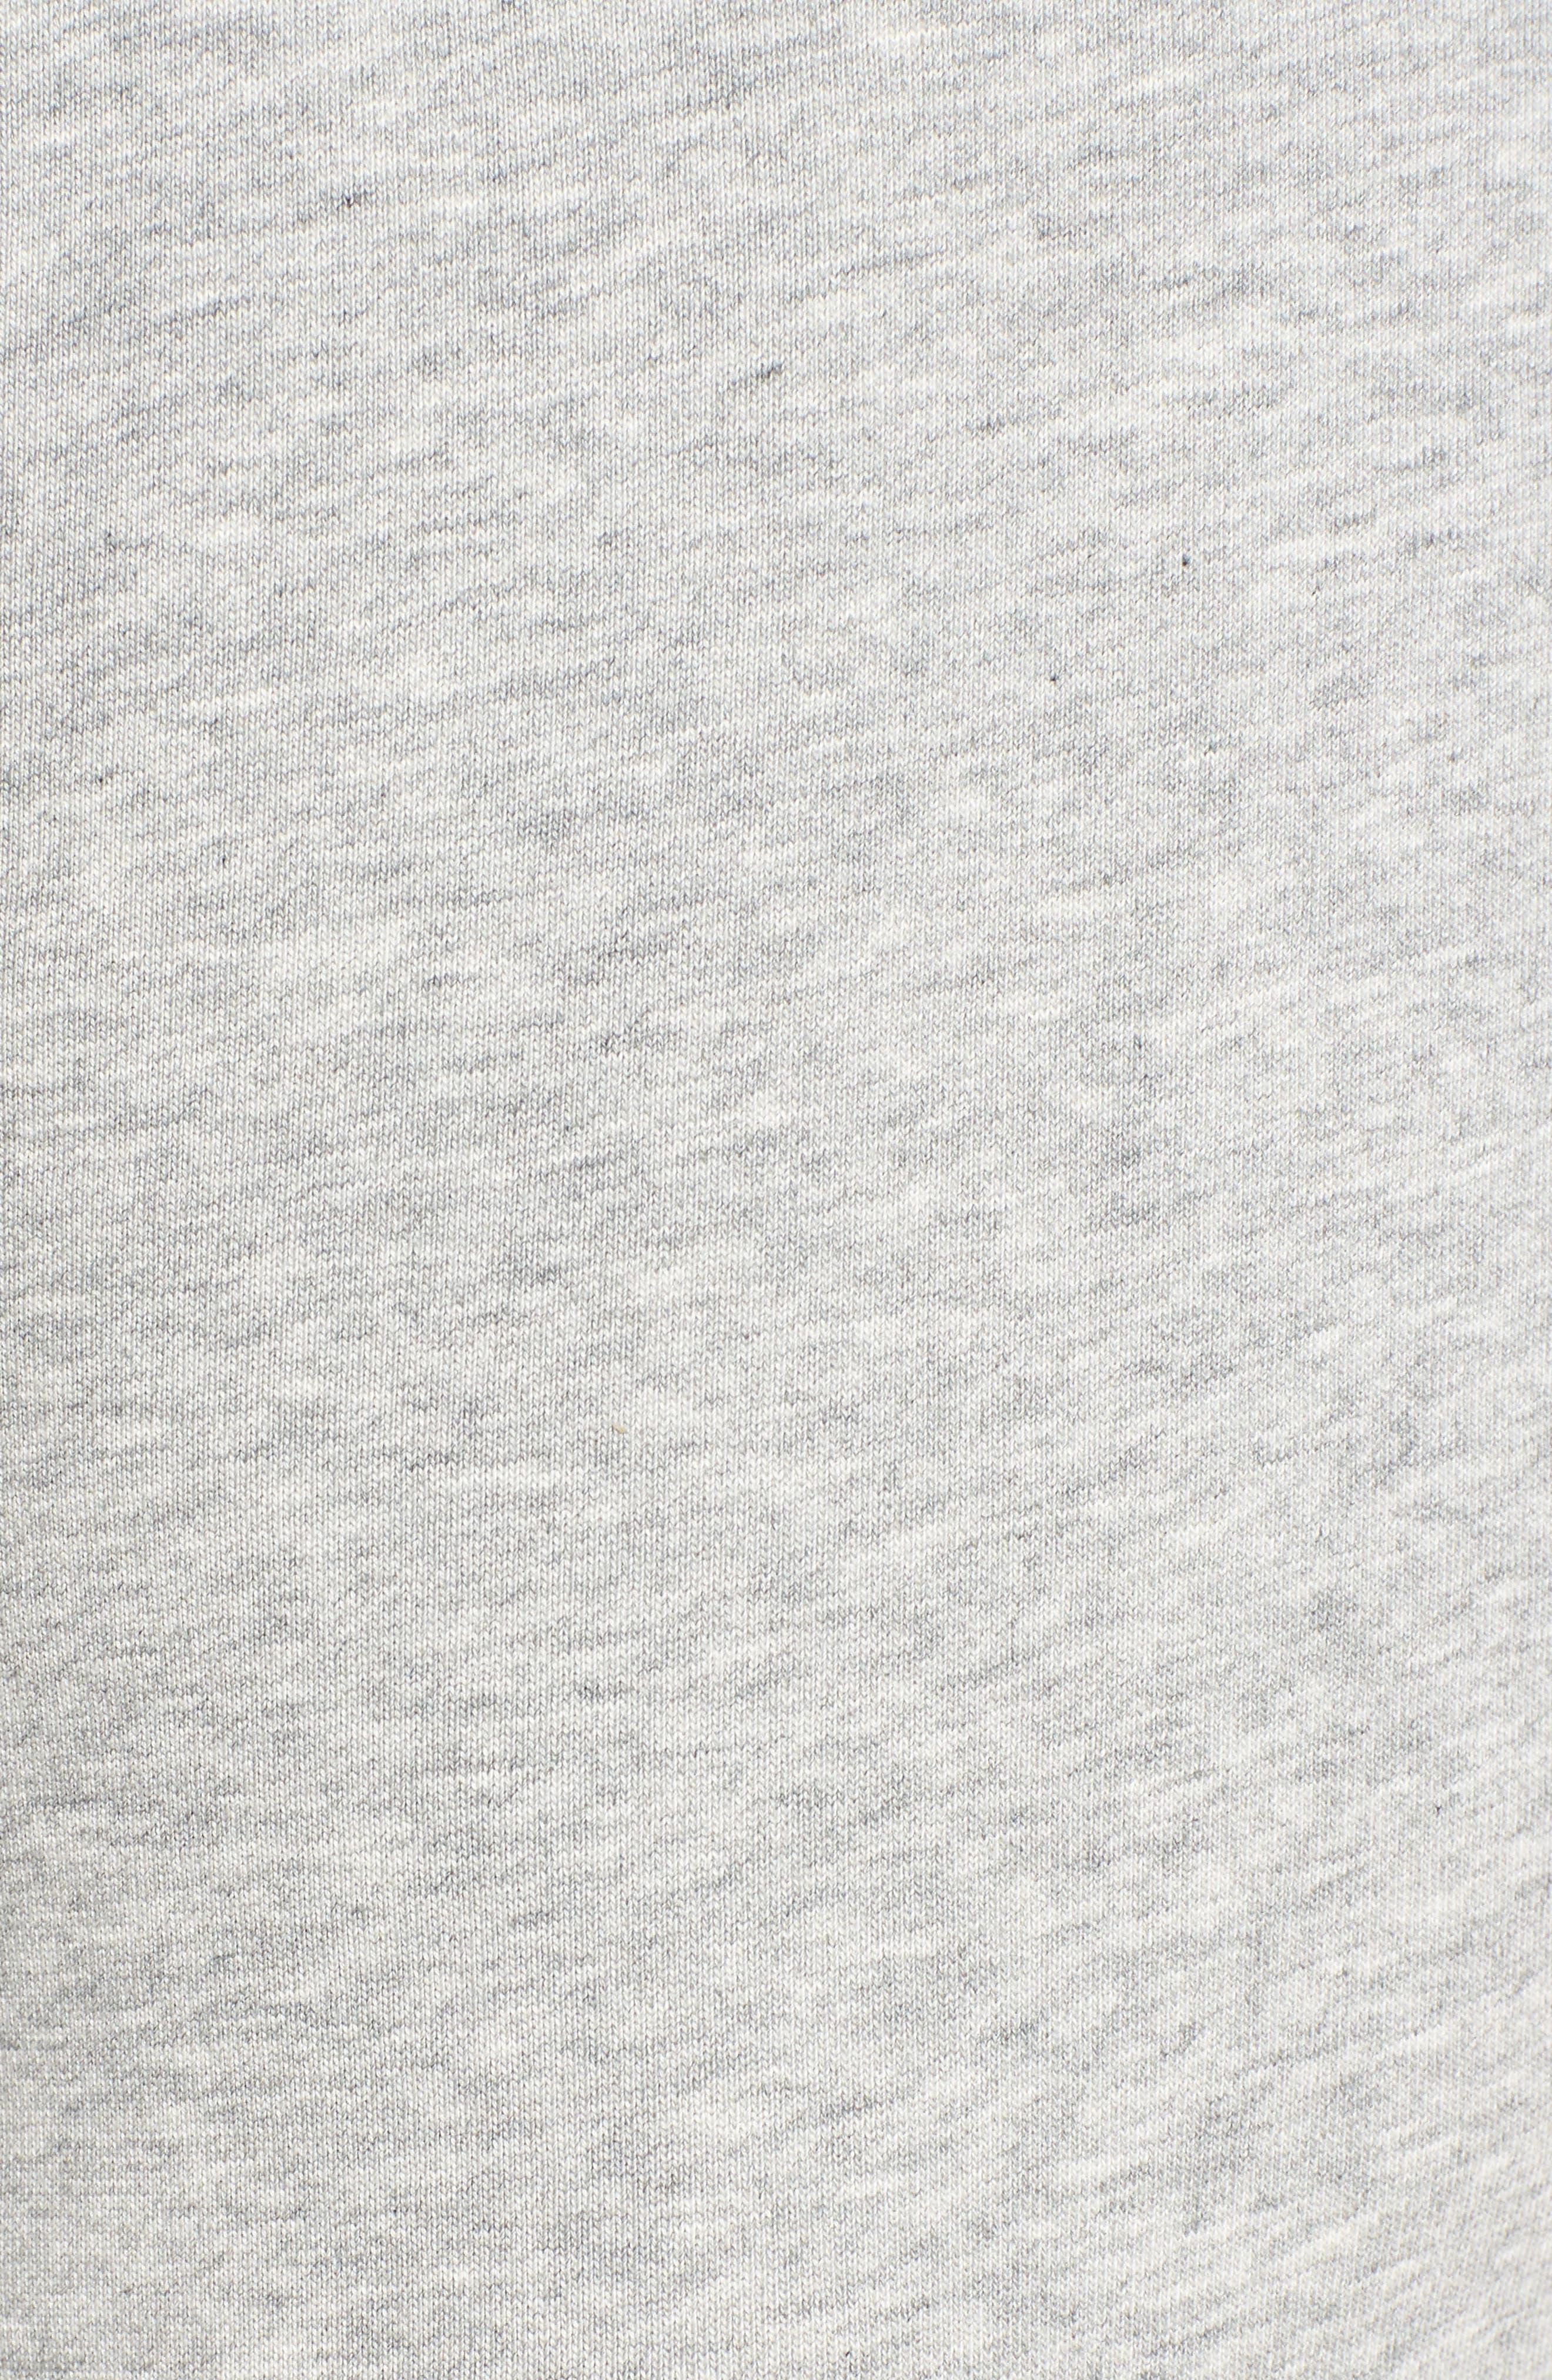 Paneled Sweatpants,                             Alternate thumbnail 5, color,                             Black/ Med. Heather Grey